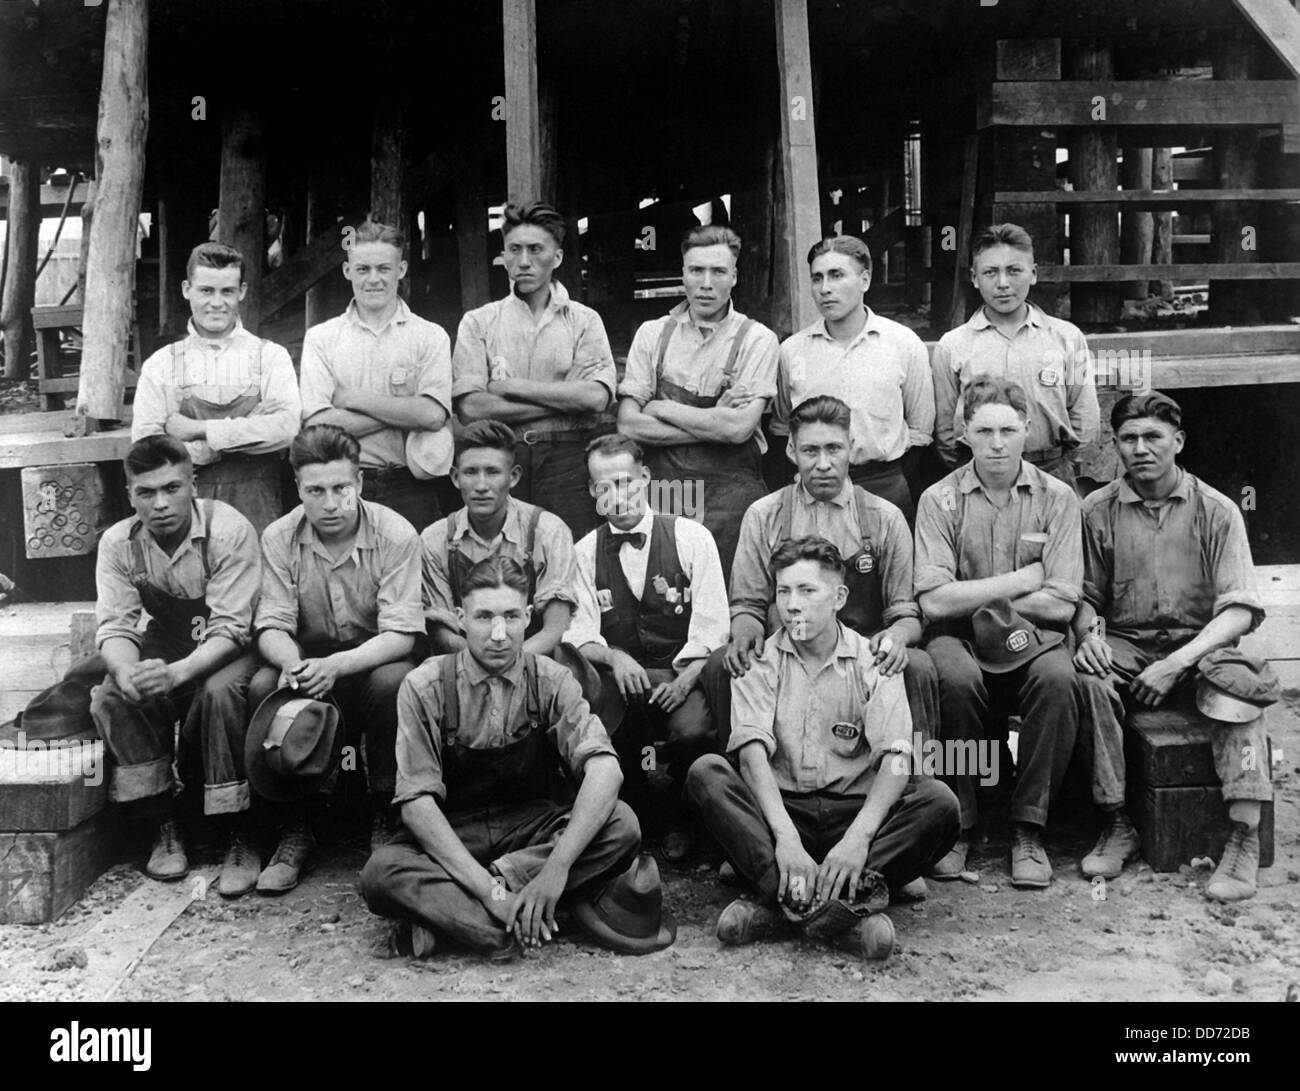 Native Pa Plants: The Philadelphia Shipyard Stock Photos & The Philadelphia